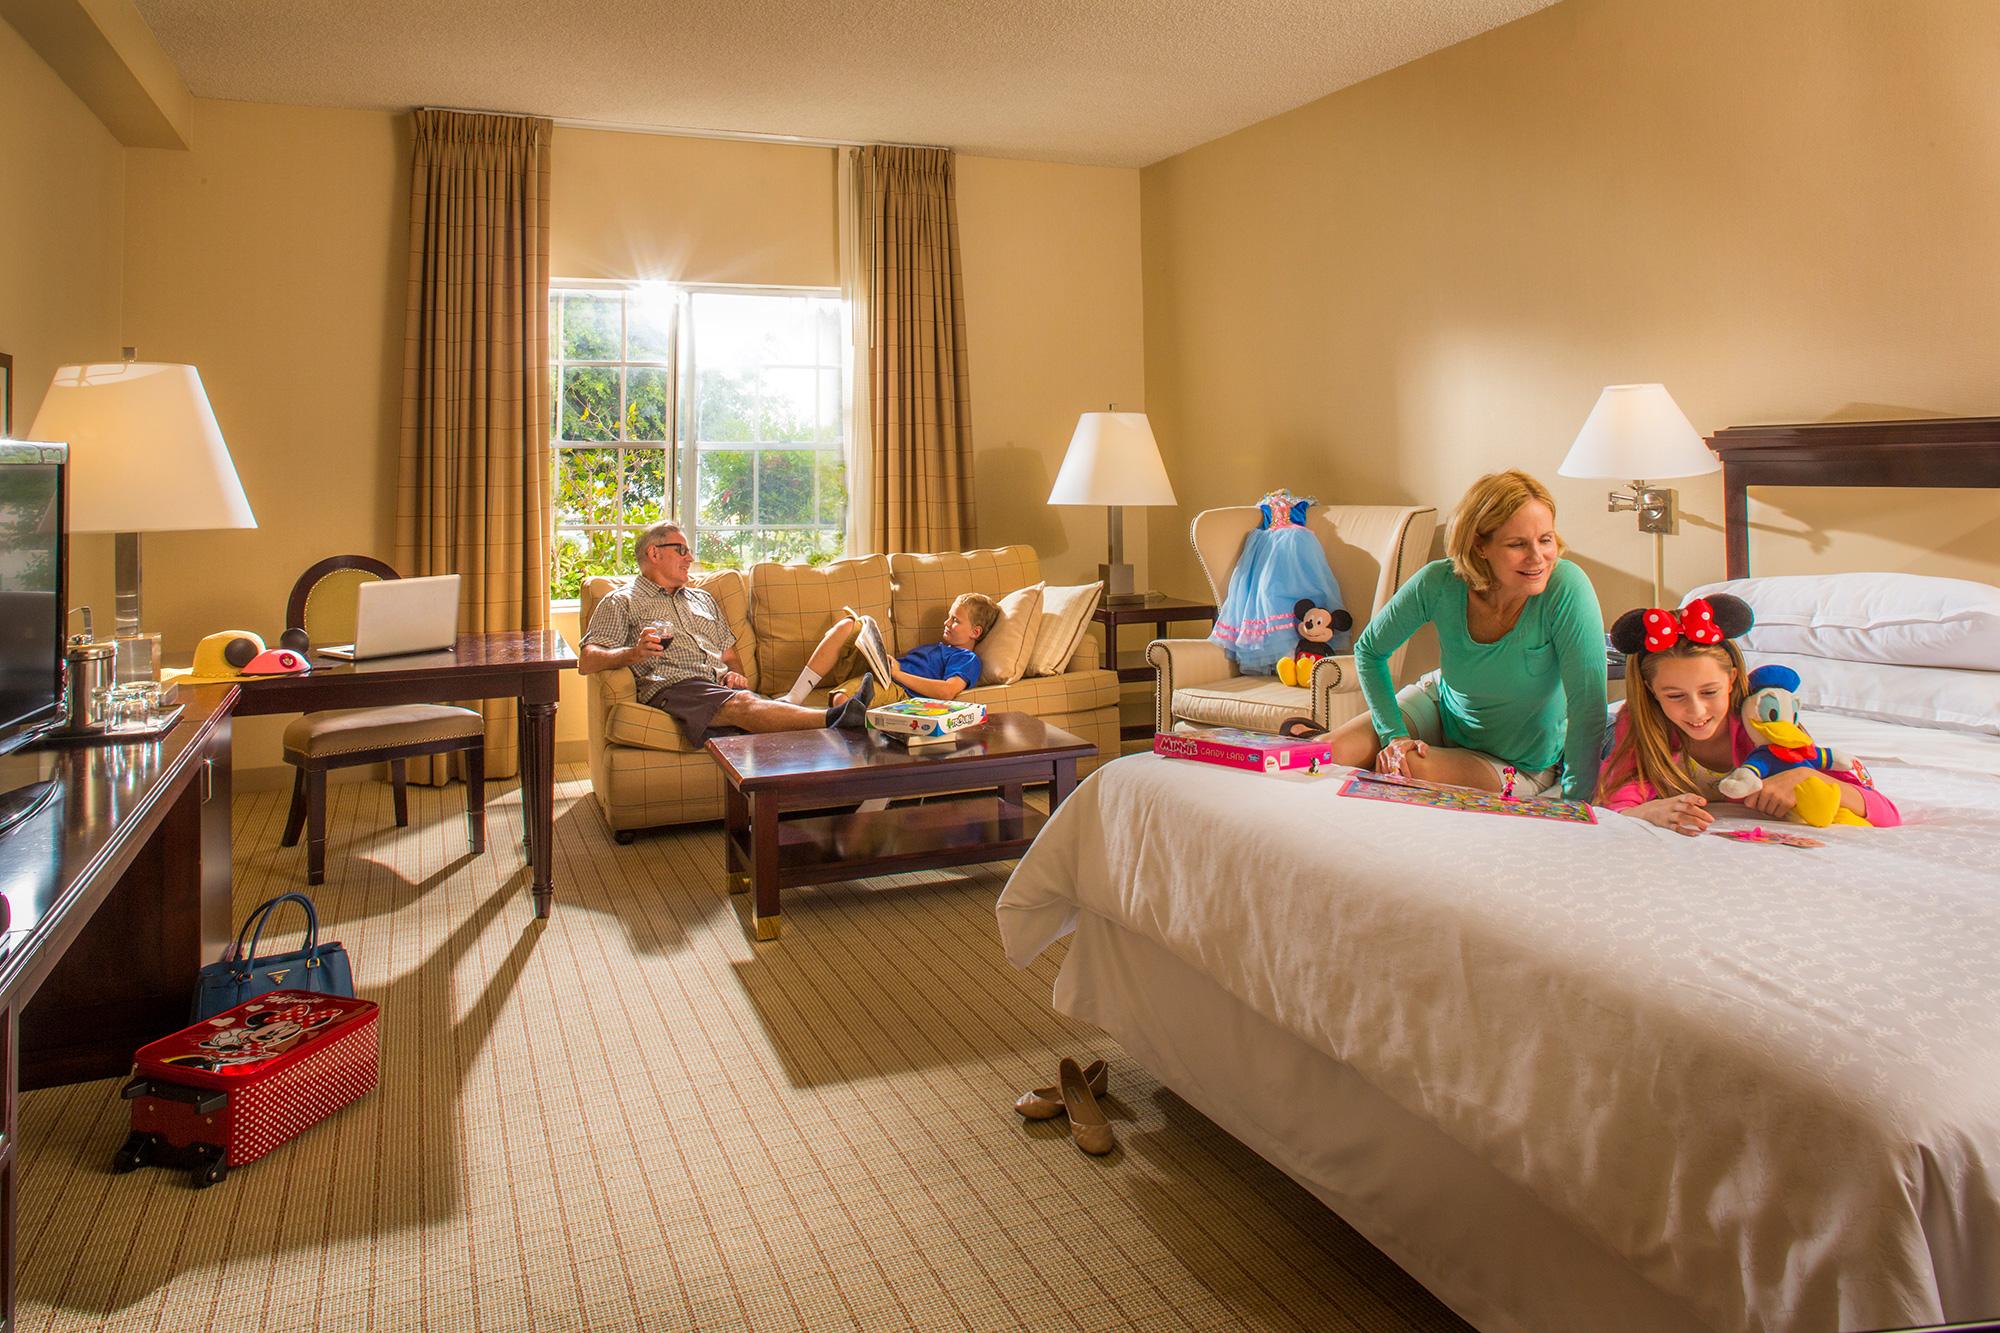 Family Friendly Hotel Rooms Anaheim Majestic Garden Hotel